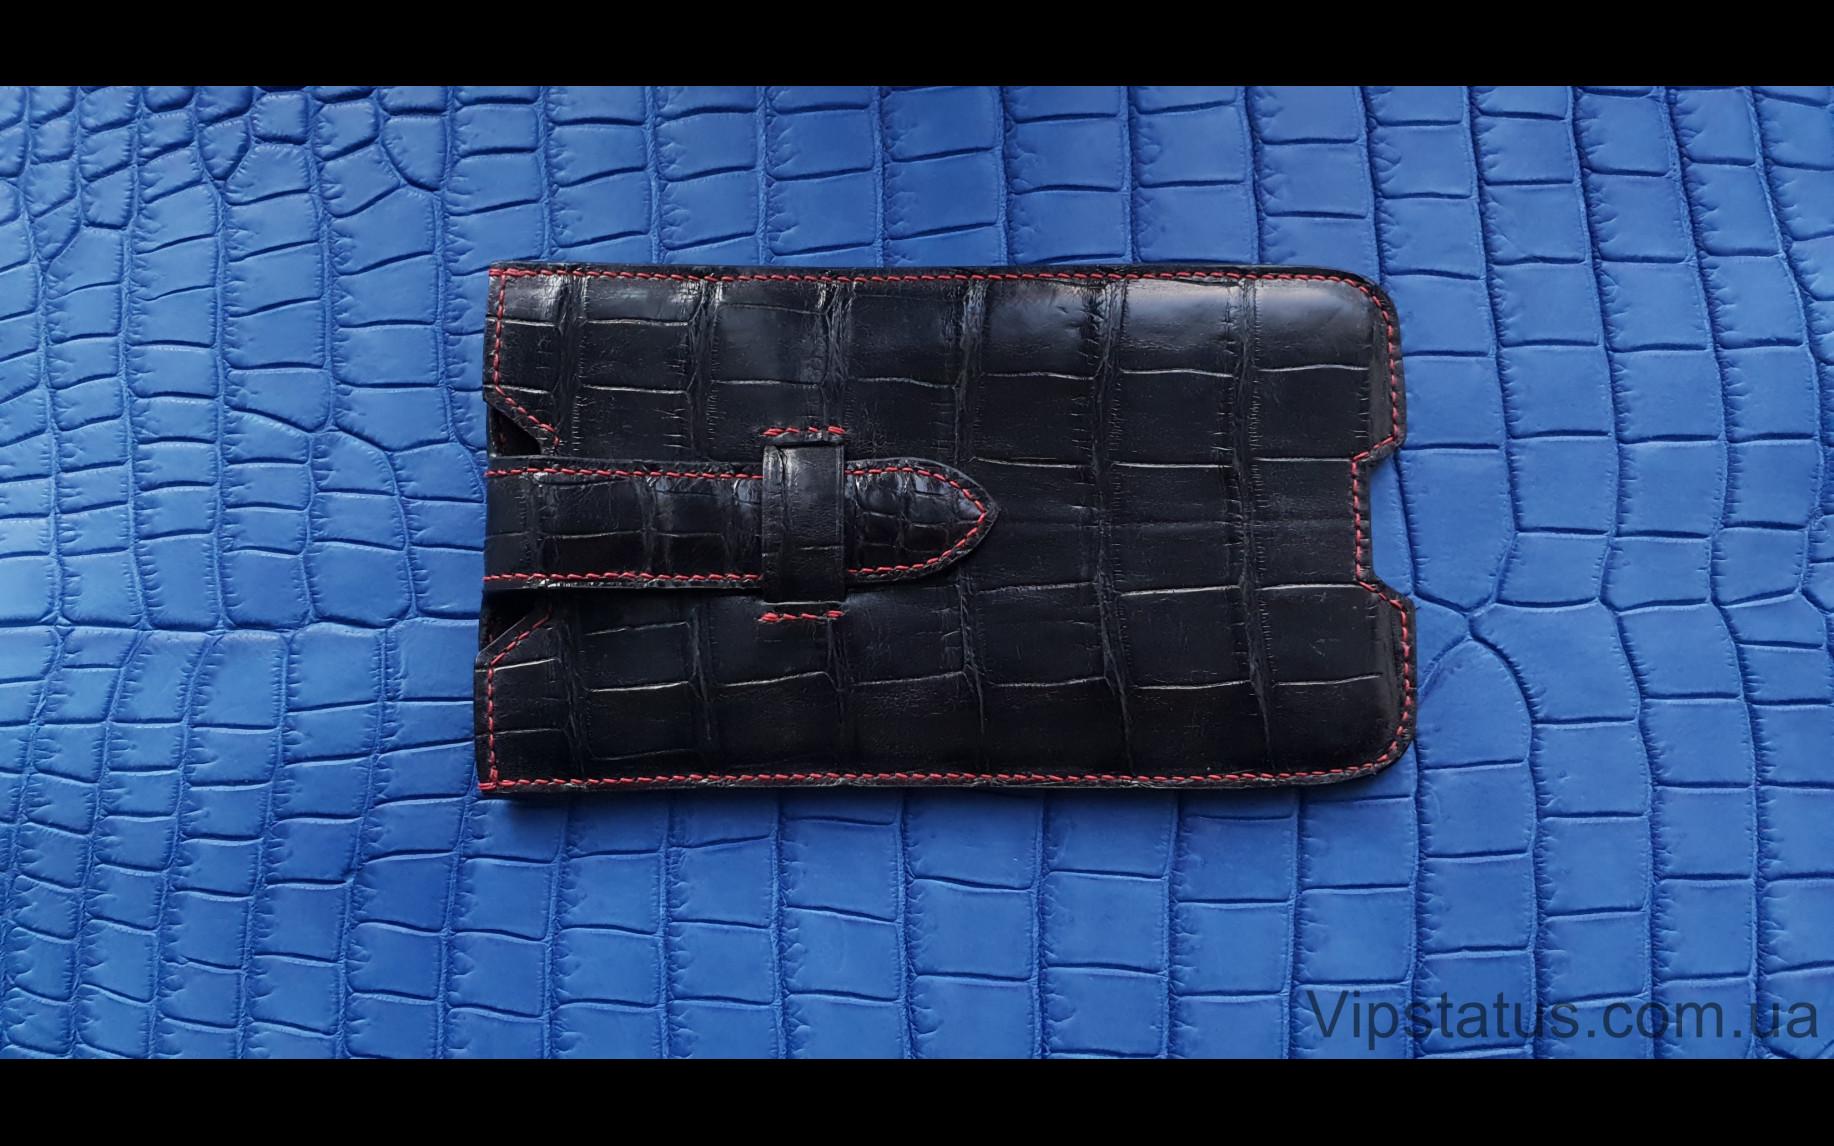 Elite Classic Edition Премиум кейс IPhone X XS 11 Pro 12 Pro Classic Edition Premium case IPhone X XS 11 Pro 12 Pro Crocodile leather image 4